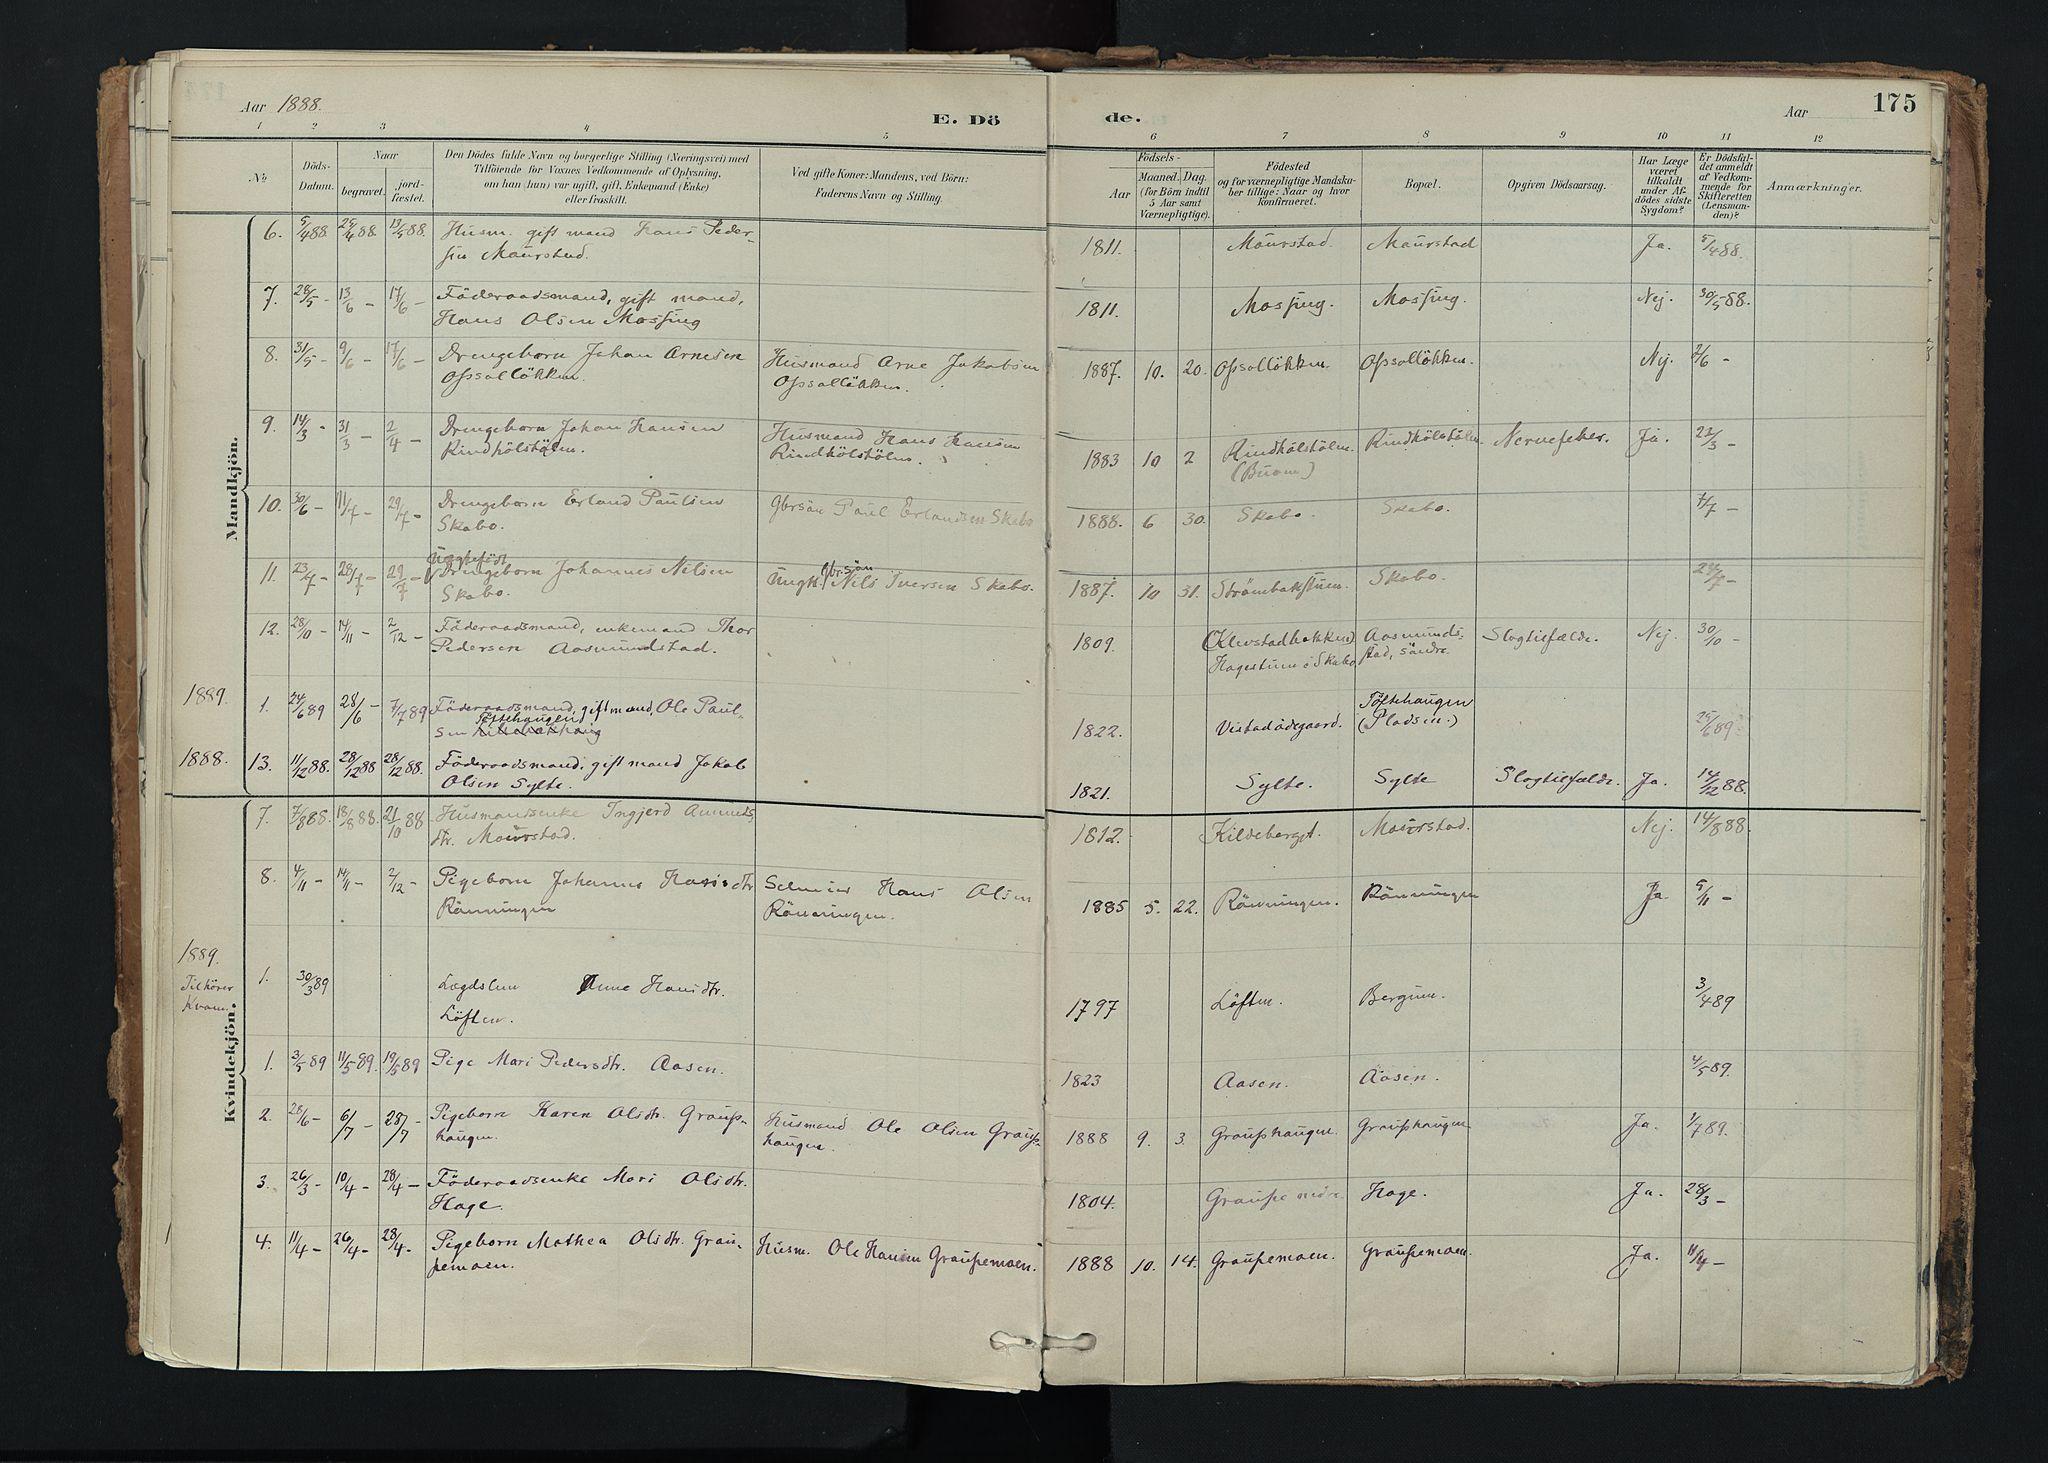 SAH, Nord-Fron prestekontor, Ministerialbok nr. 5, 1884-1914, s. 175